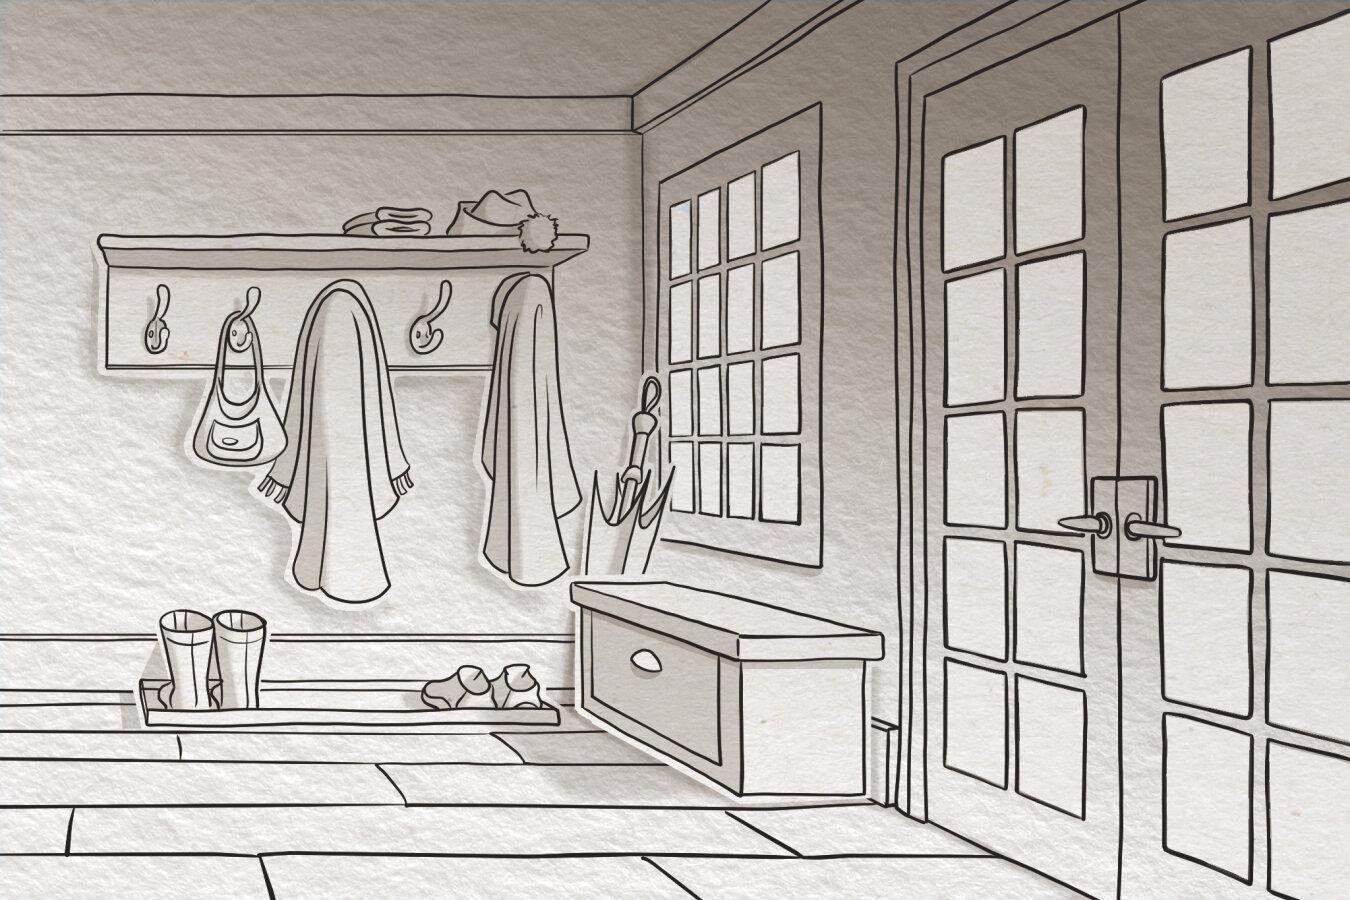 James - Hallway Scene